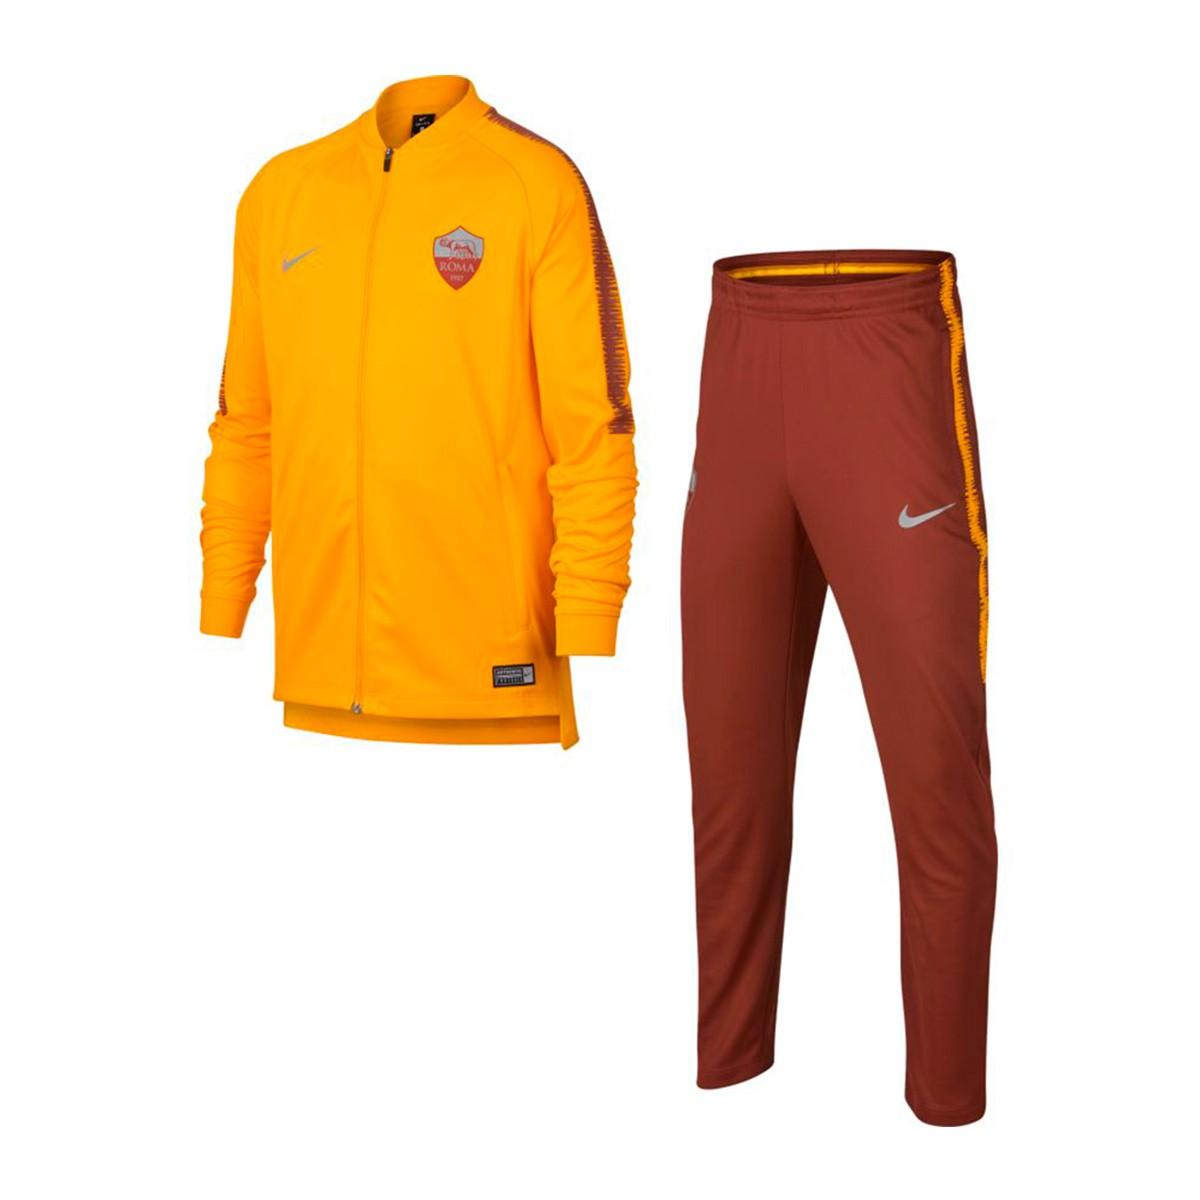 Roma Mars Nike As University Stone 2018 Gold 2019 Squad Chándal Niño PfqxEP